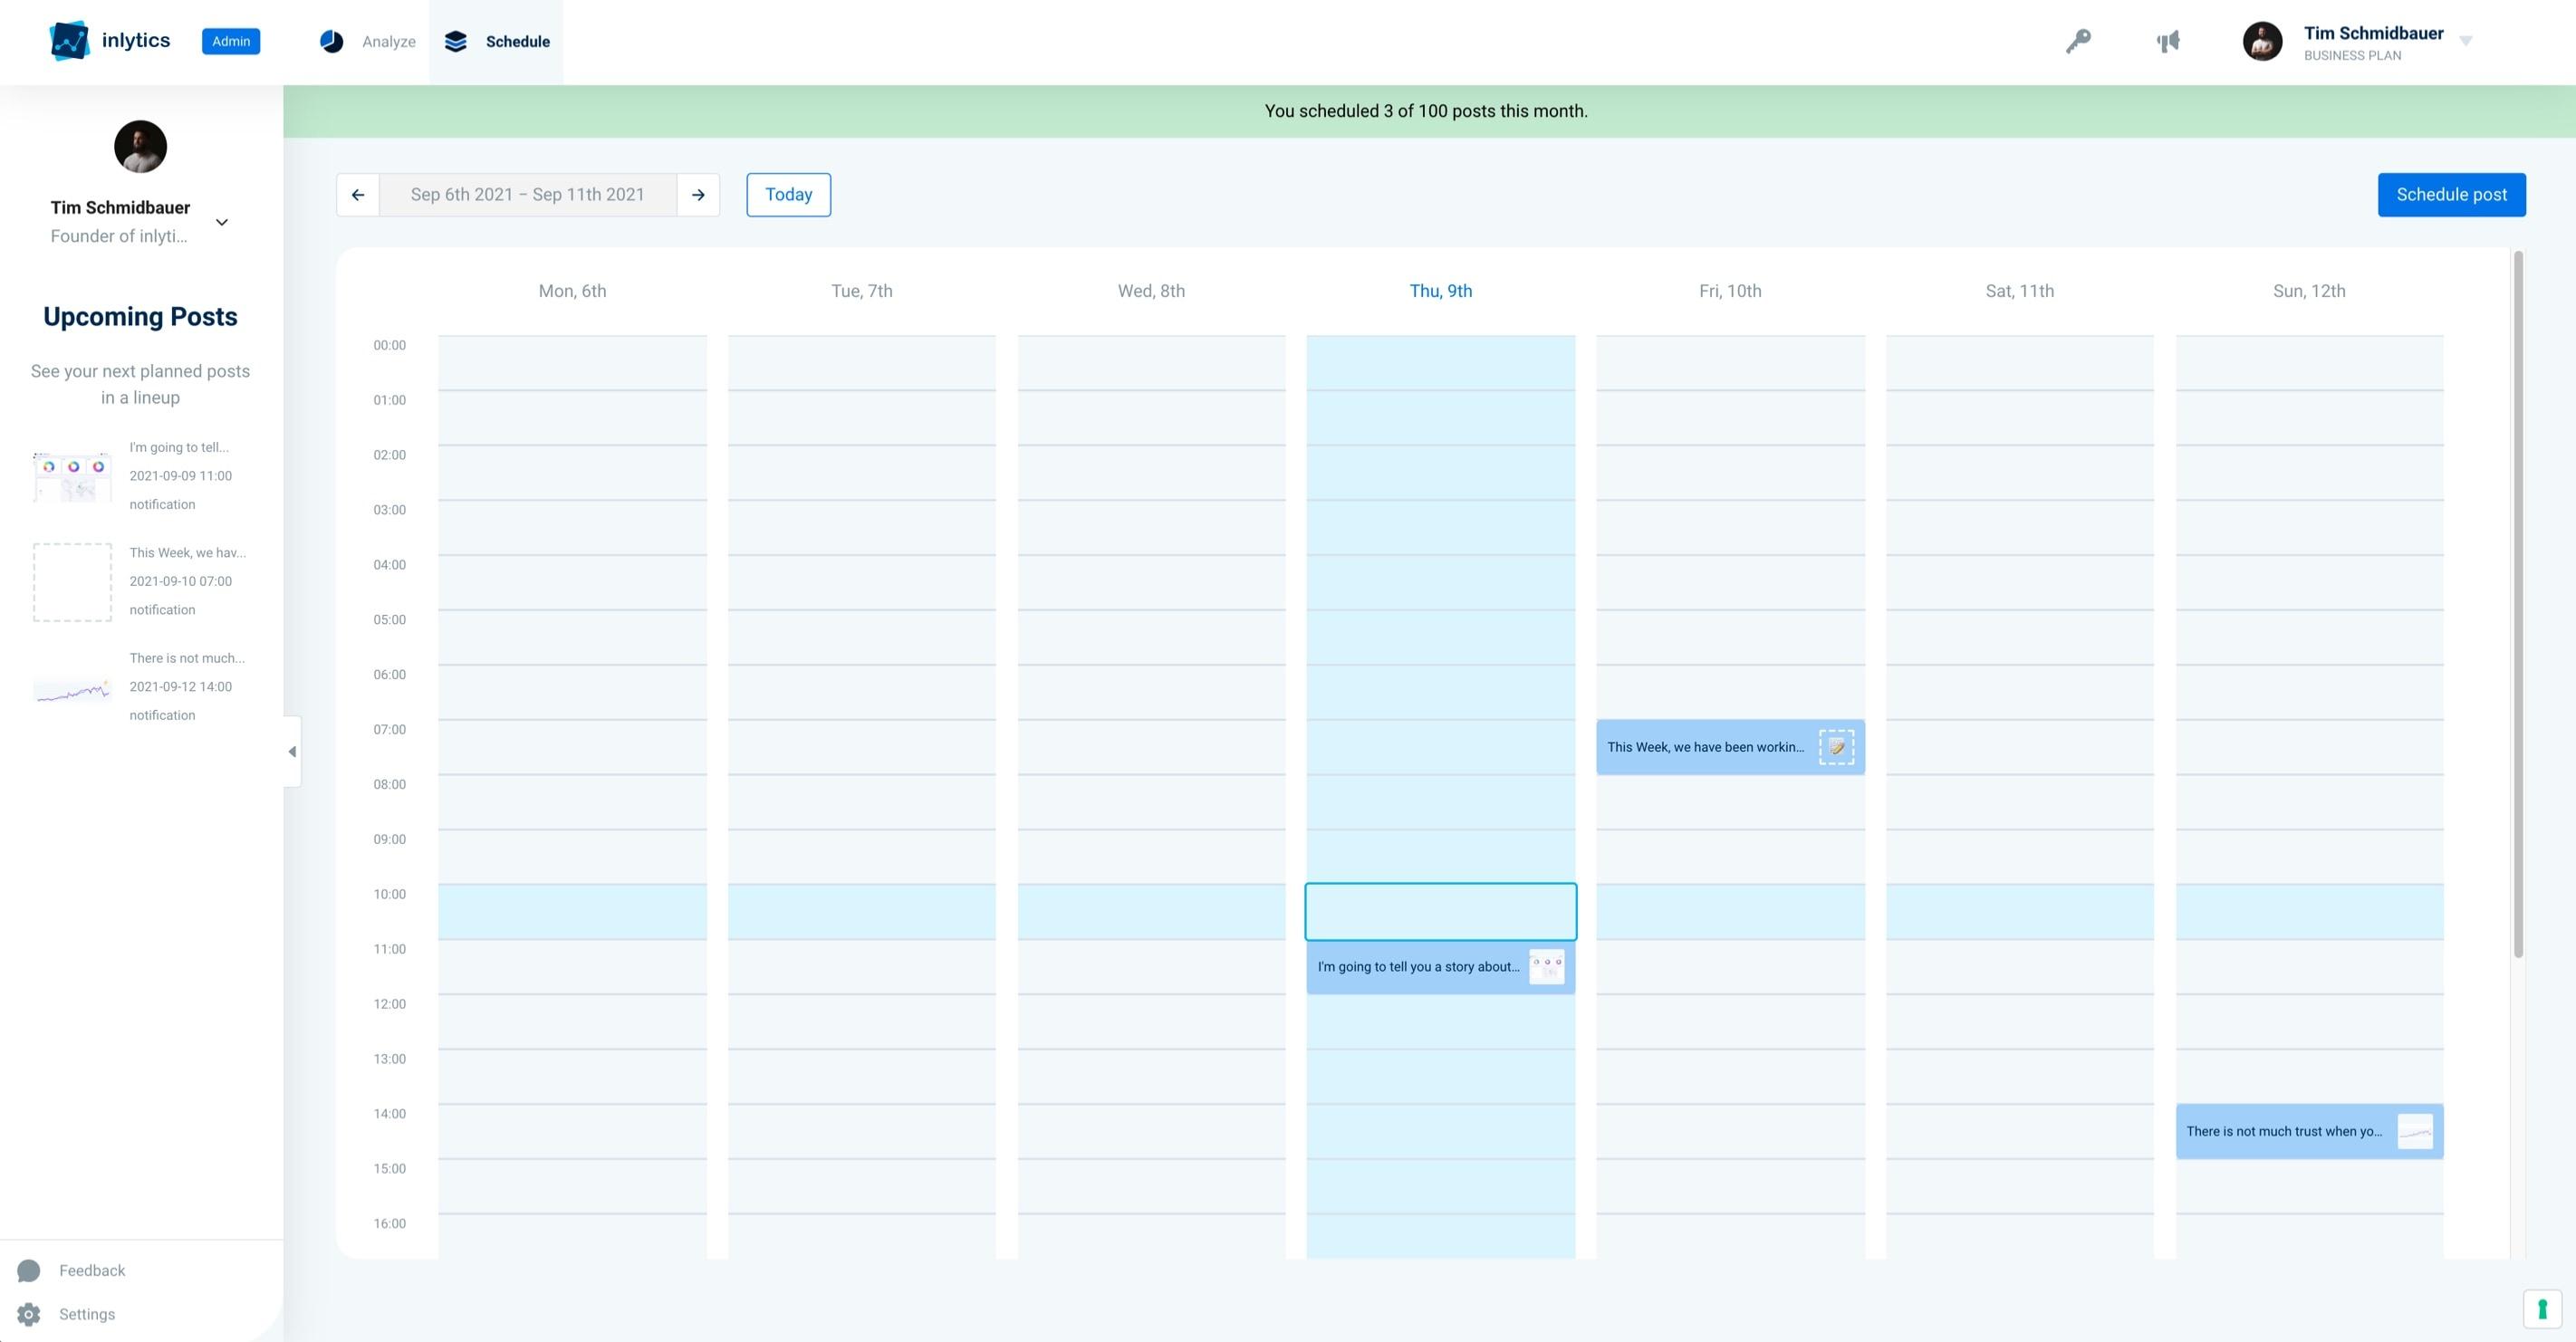 inlytics LinkedIn Analytics Tool - Content scheduling calendar auto publishing